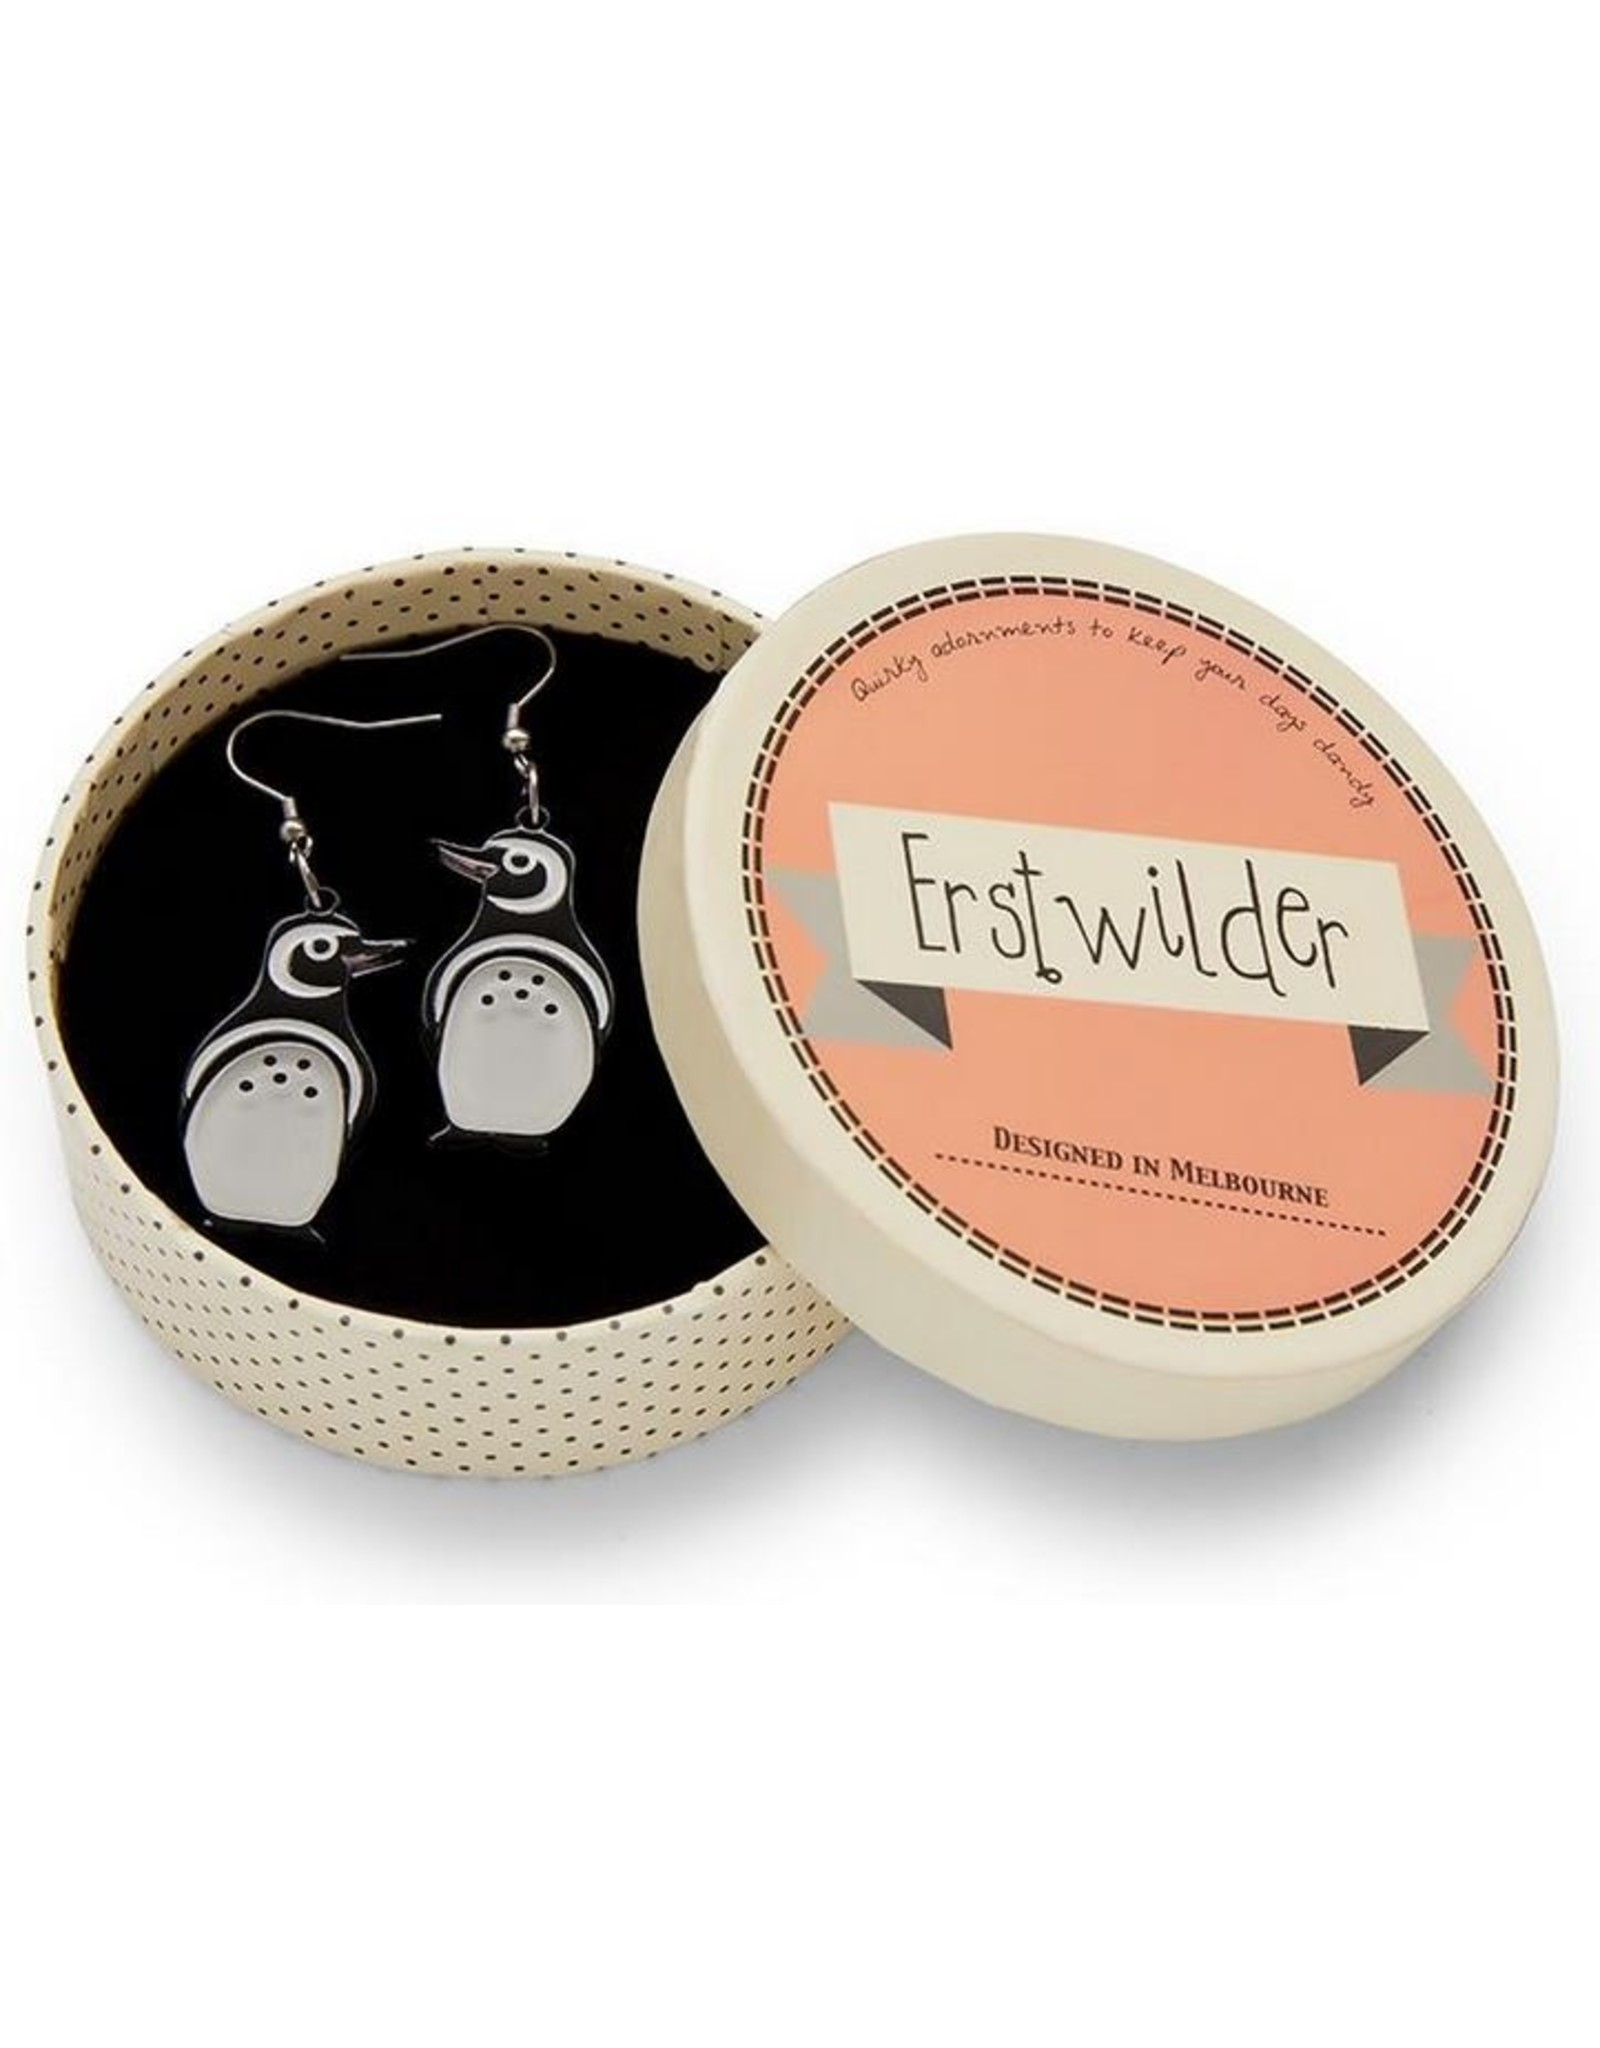 Erstwilder Northside Wanderer Penguin Earrings